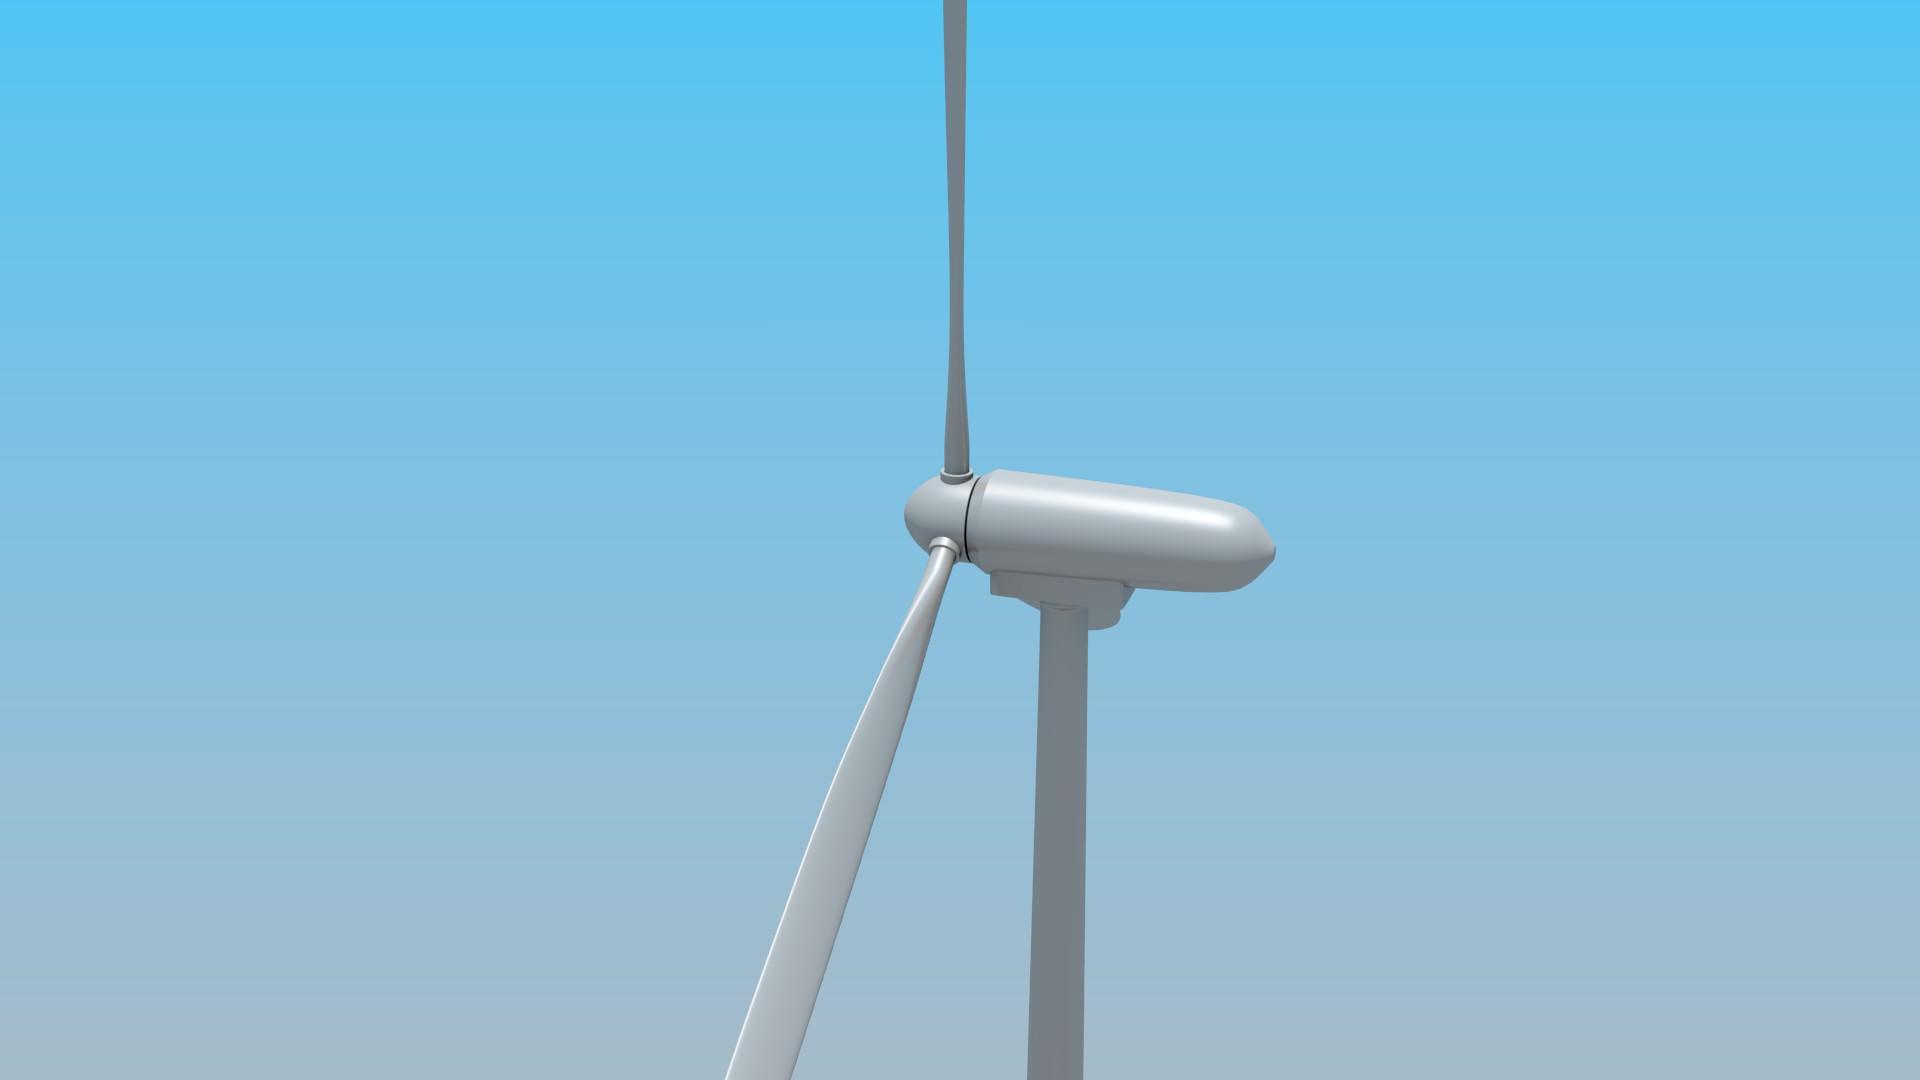 27k 0 description comments 0 wind turbine 3d model a wind turbine ...